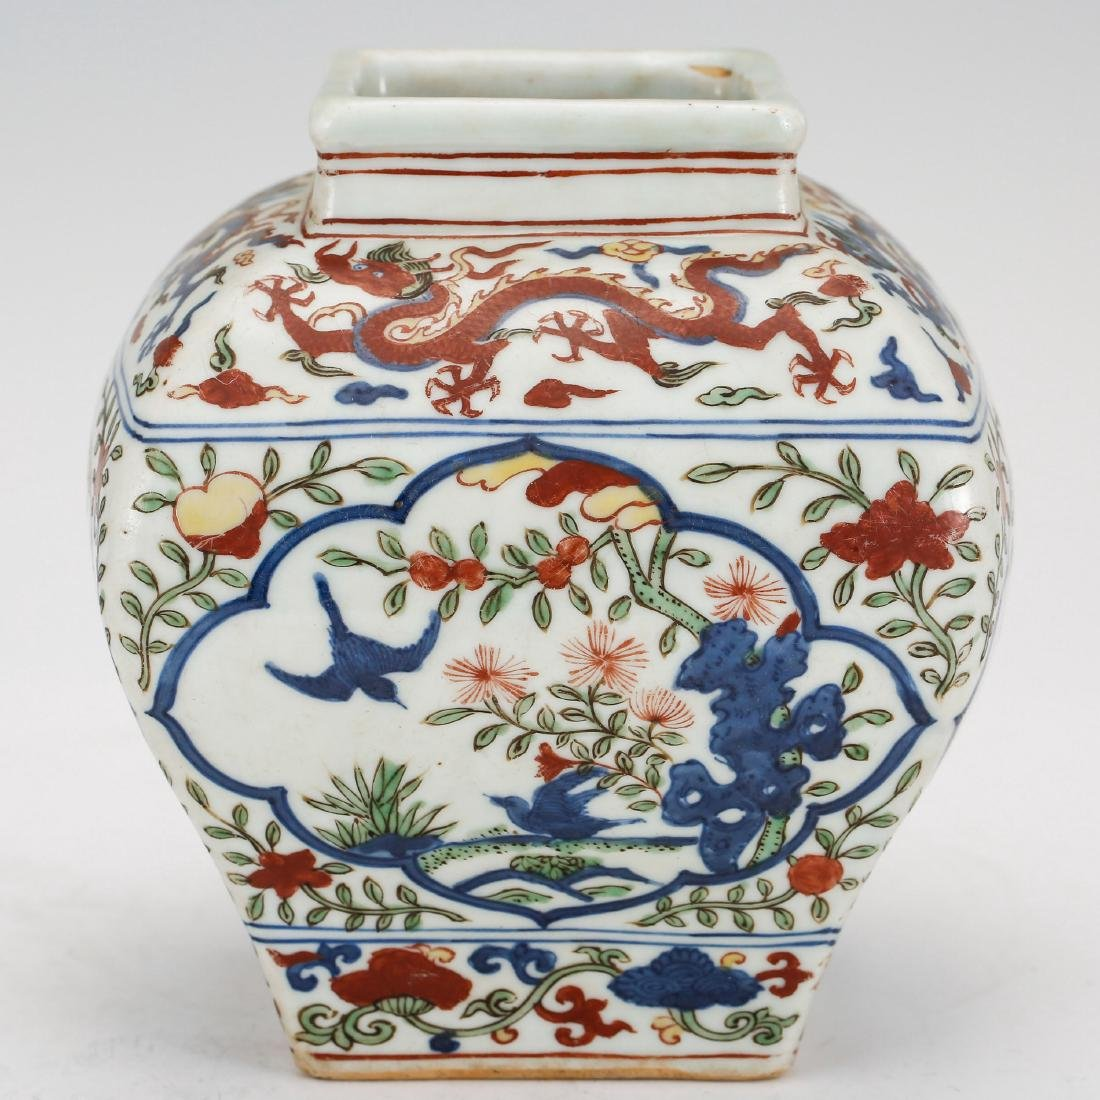 CHINESE MING DYNASTY WUCAI PORCELAIN JAR